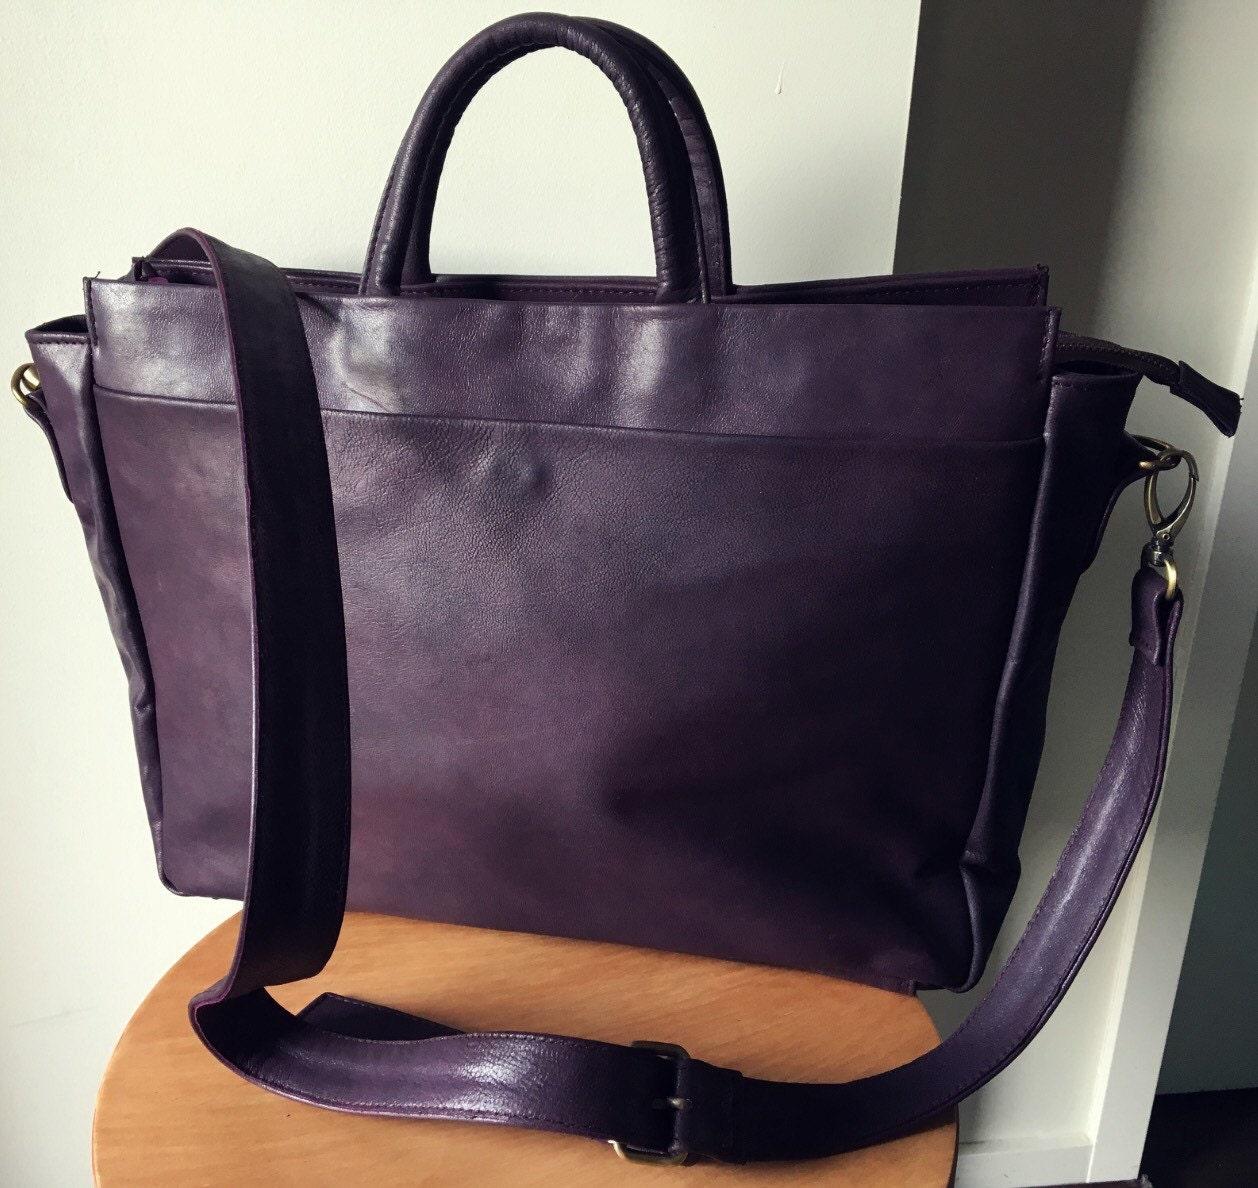 Genuine leather work laptop compendium, computer tote bag.Classy ...